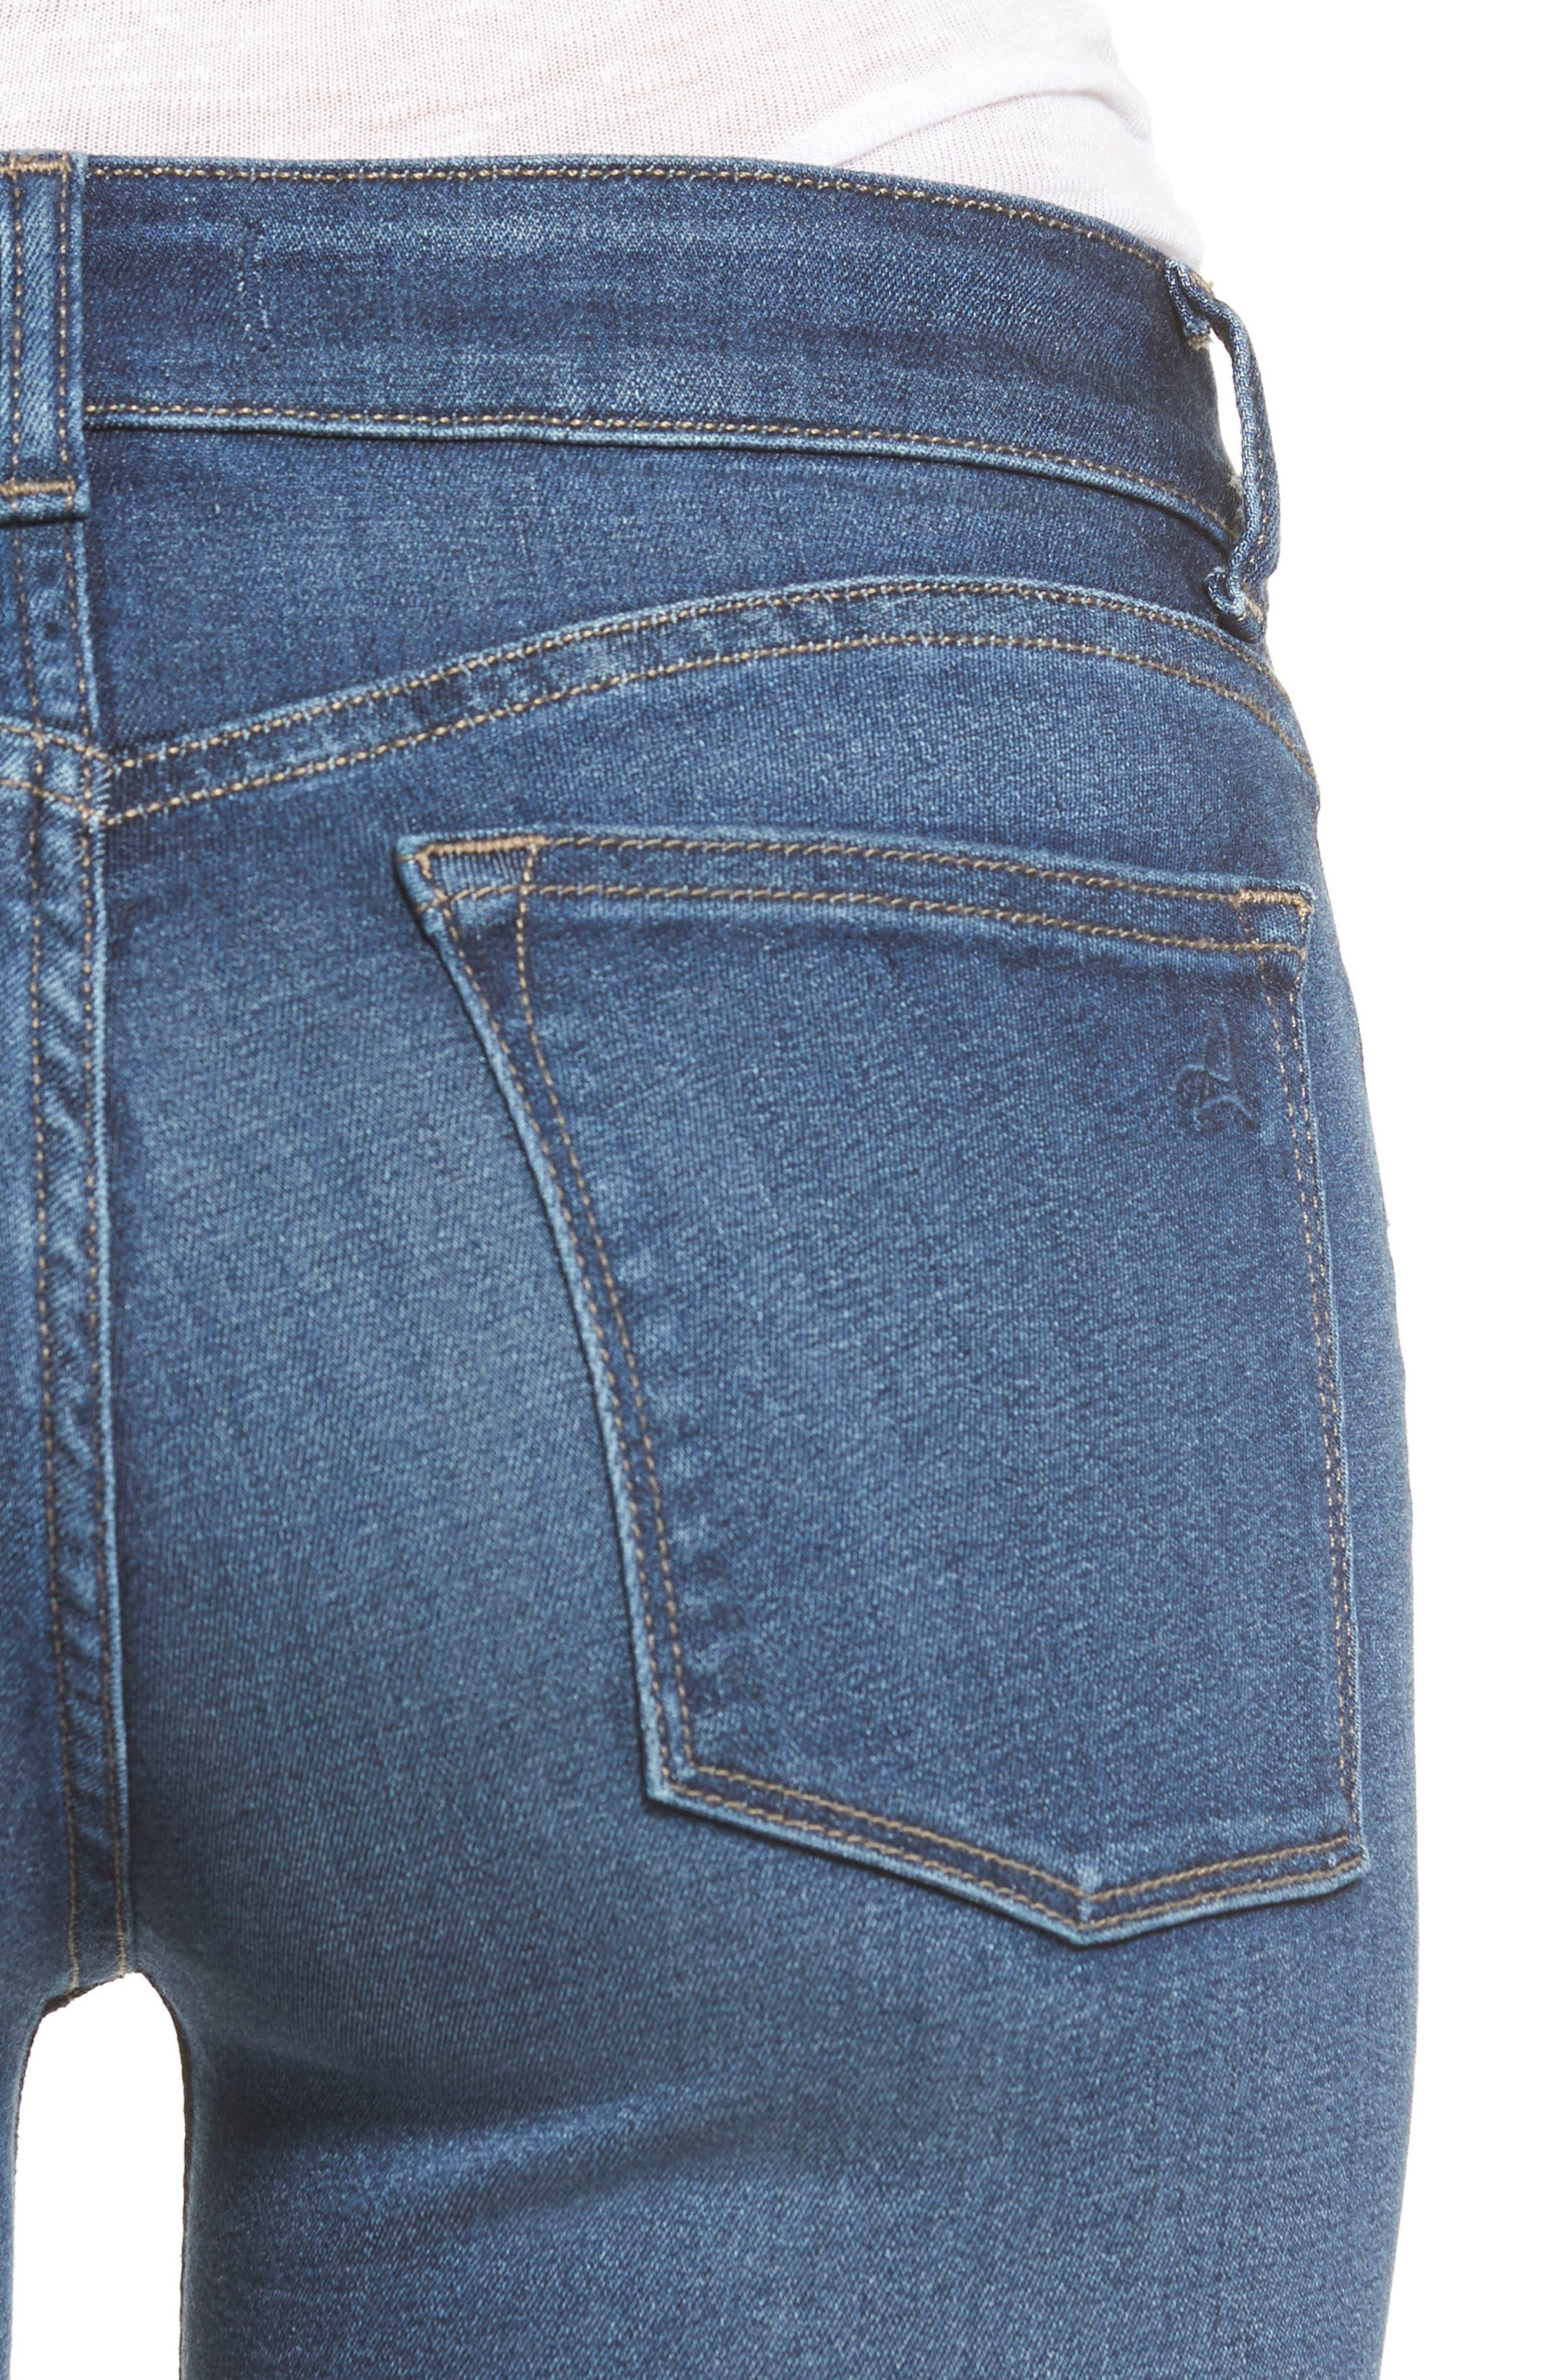 Emma Power Legging Jeans,                             Alternate thumbnail 4, color,                             405